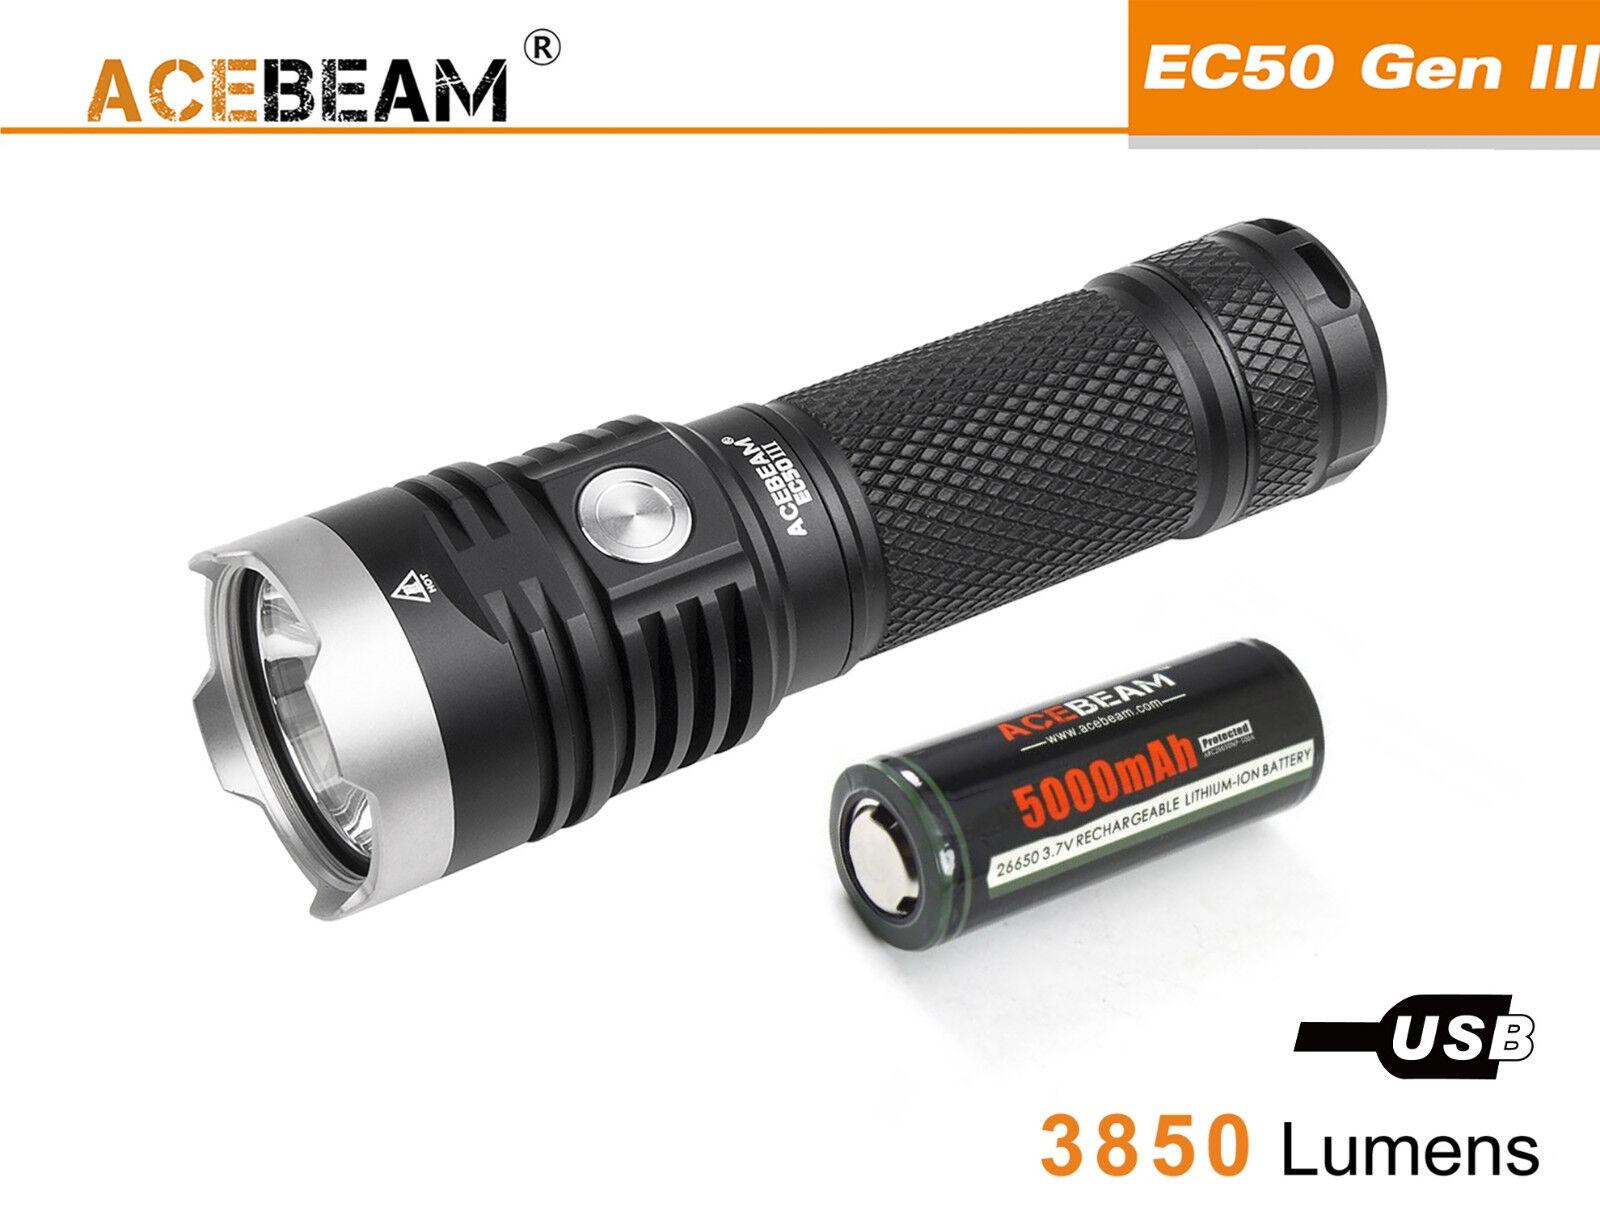 New AceBeam EC50 Gen III Cree XHP70.2 3850 Lumens 6000K LED Flashlight ( 26650 )